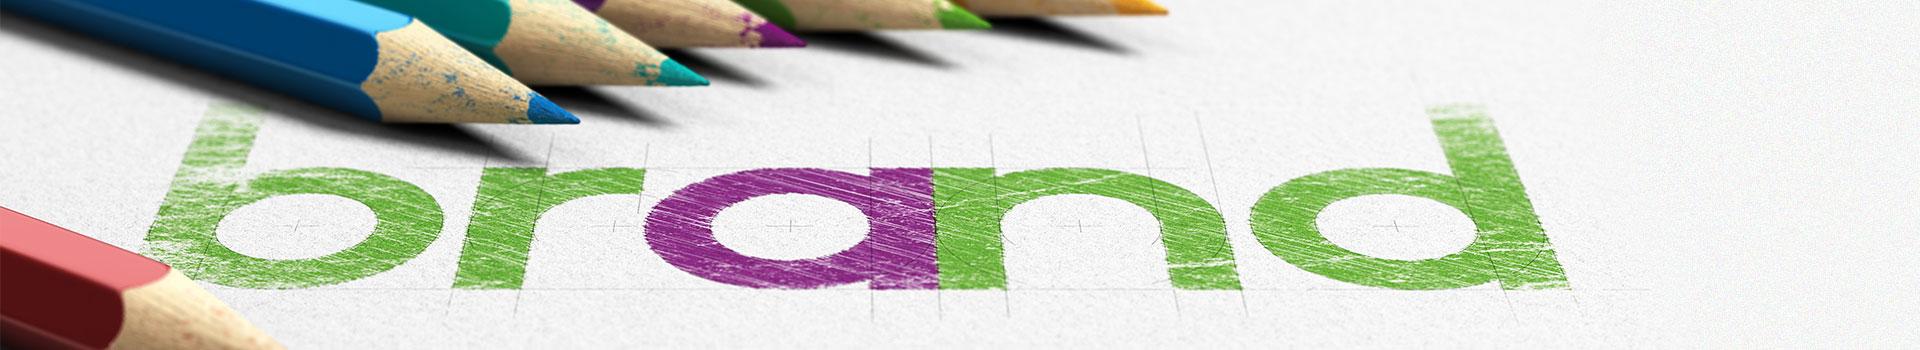 Creative Branding by Blackberry Design